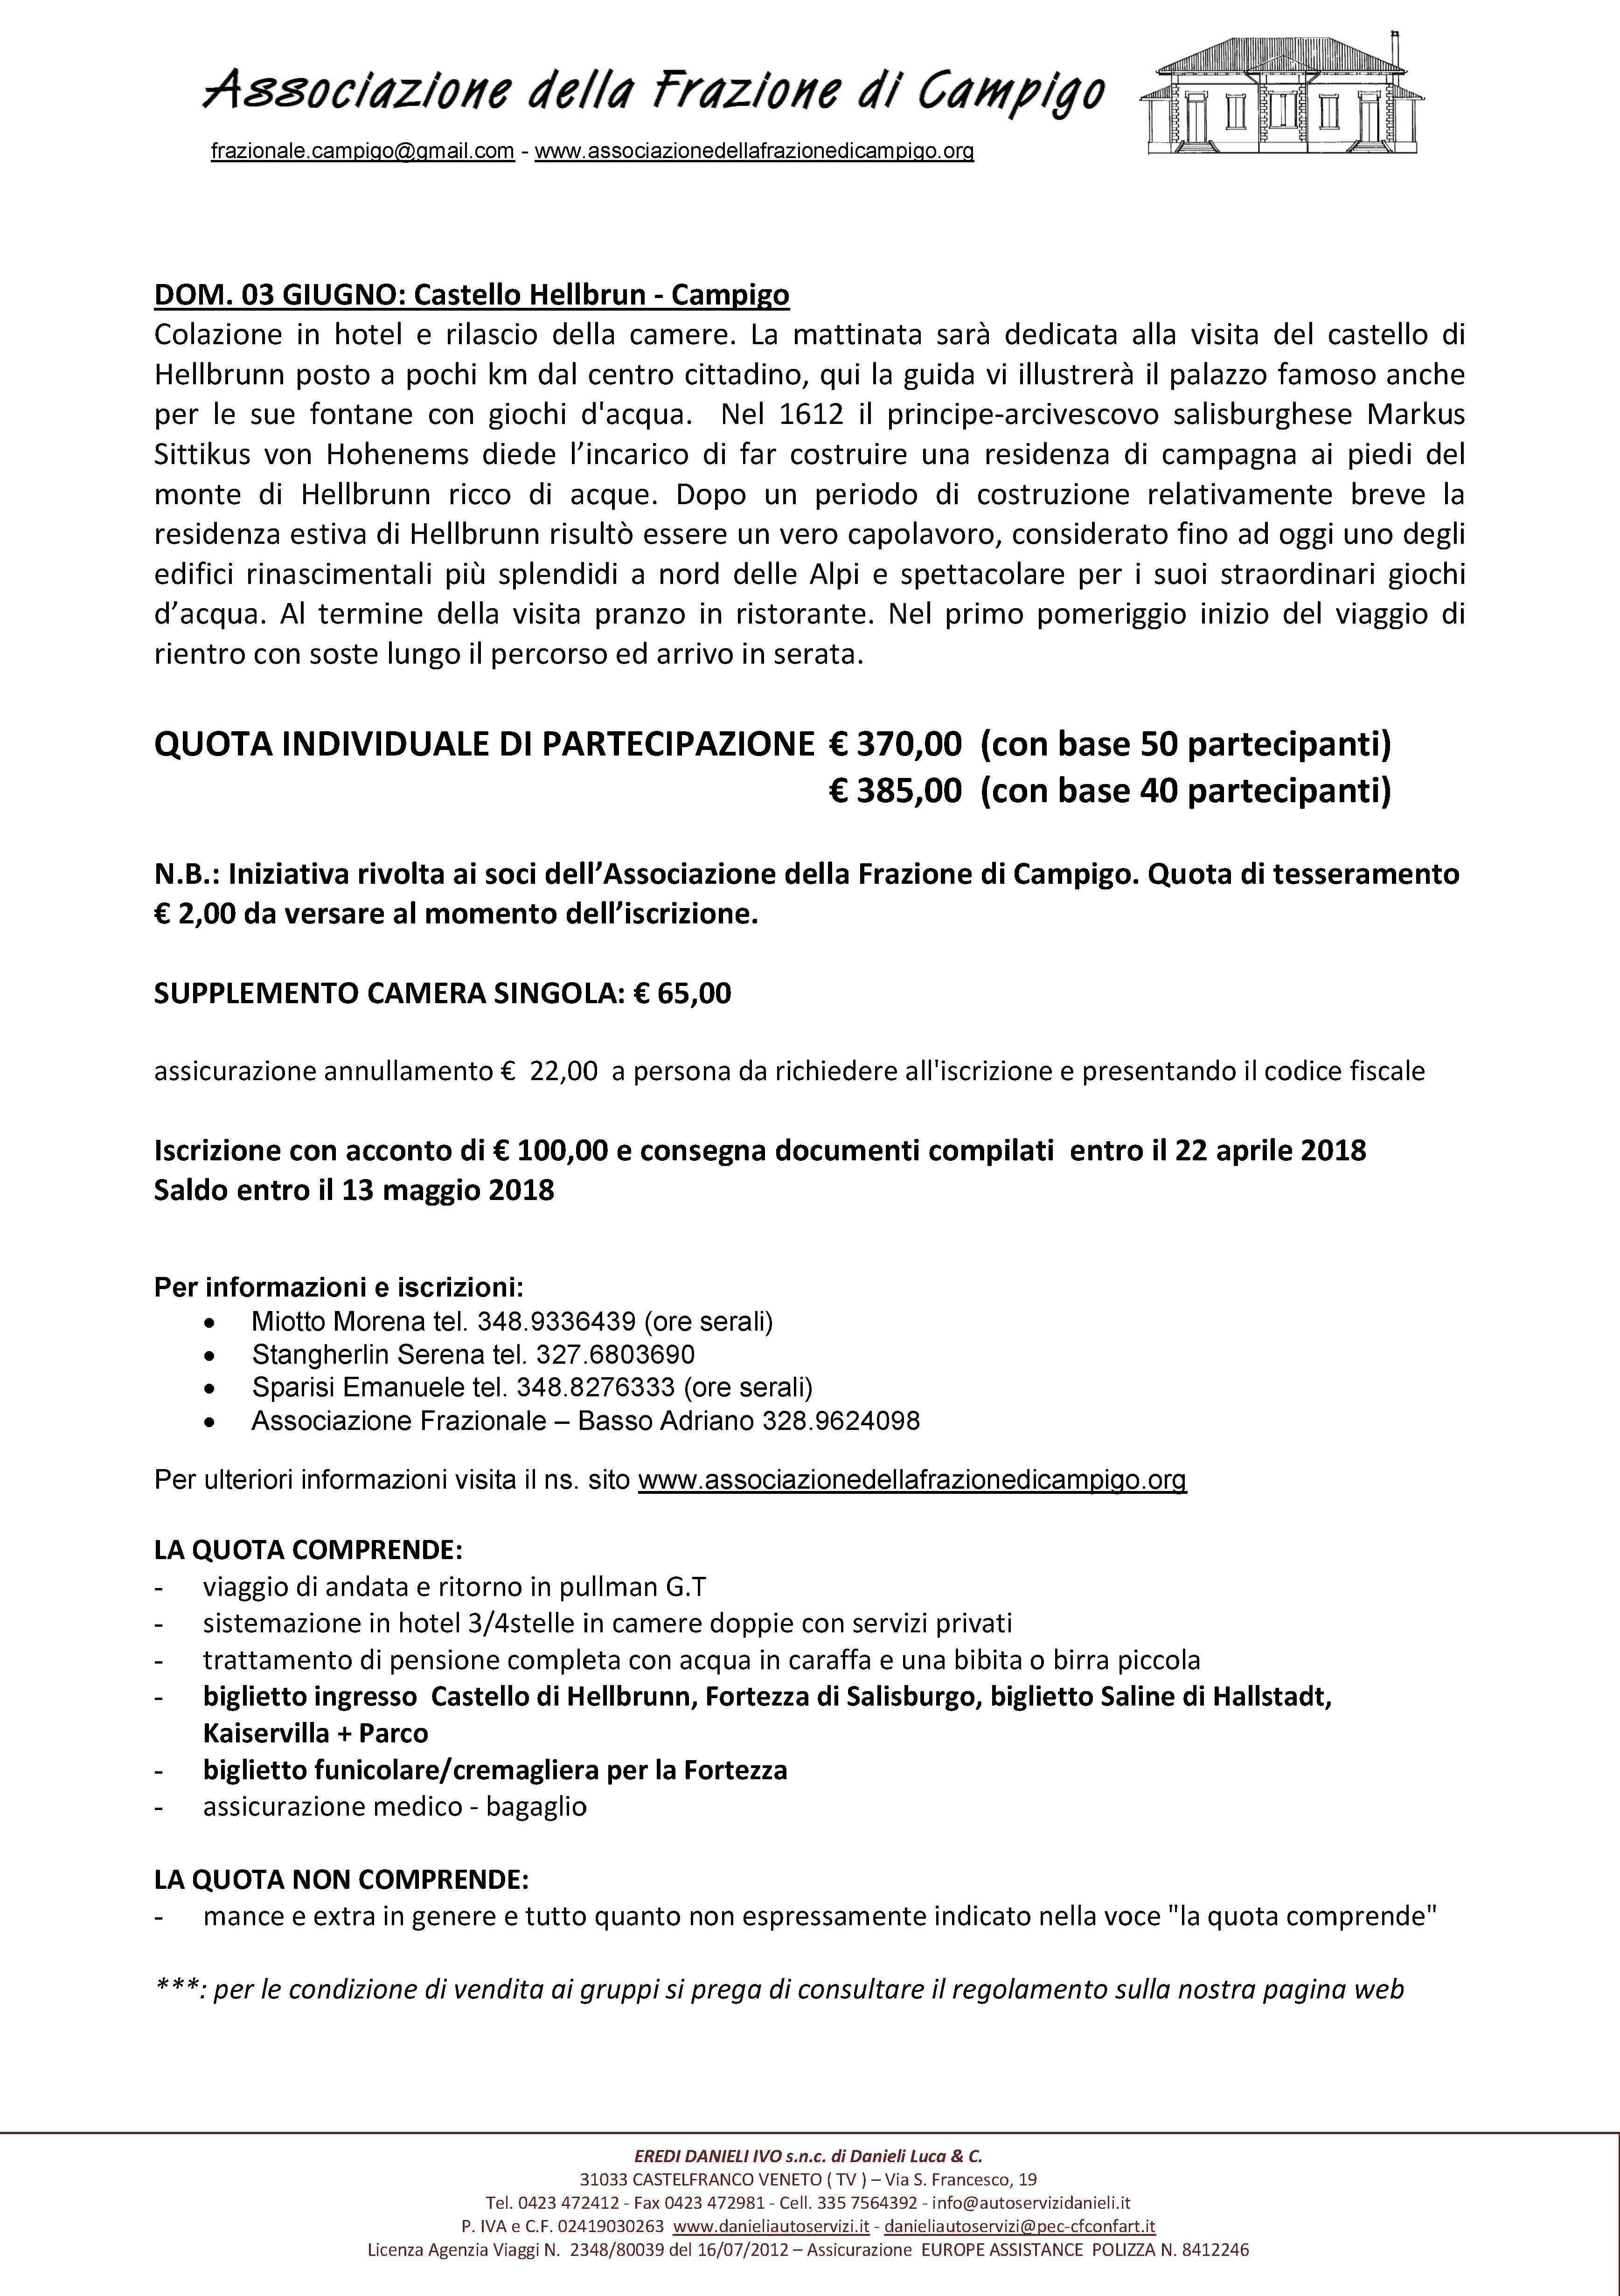 gita_salisburgo_2018_pagina_2